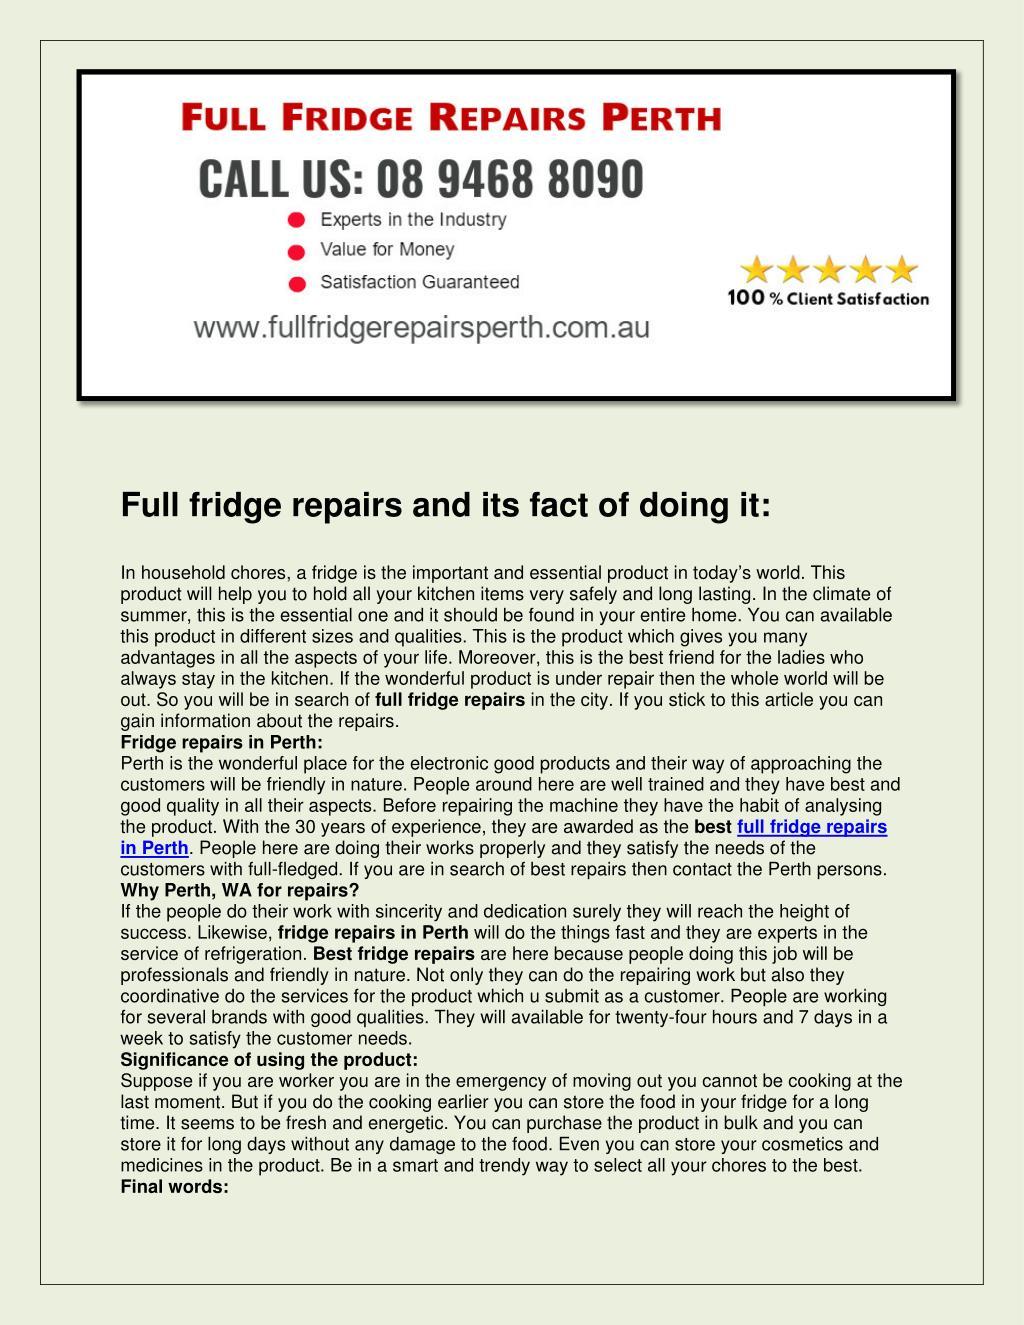 PPT - Full fridge repairs perth PowerPoint Presentation - ID:7408661